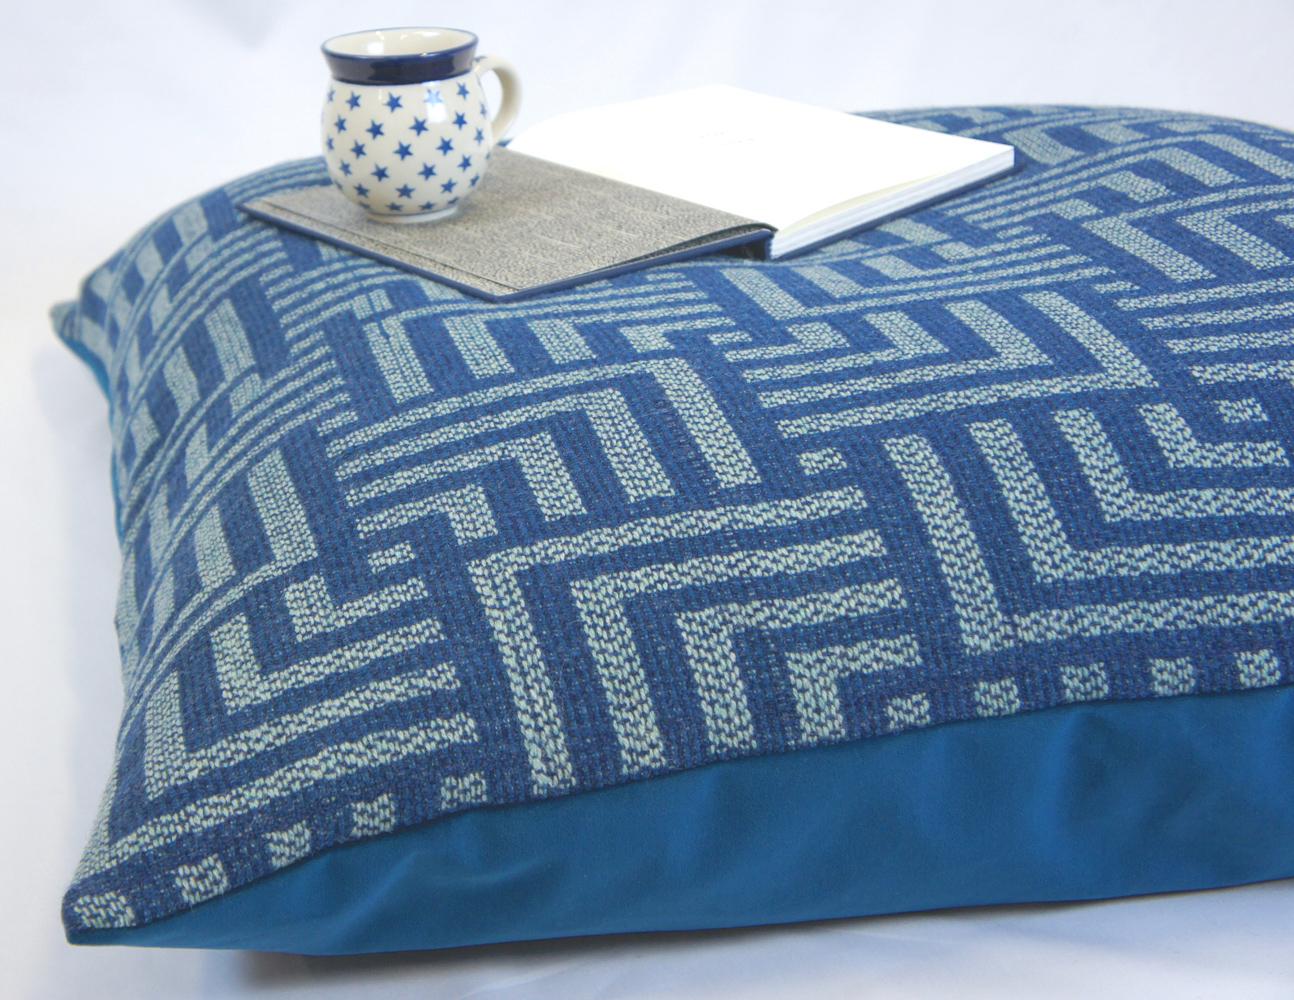 Handwoven Deco Floor Cushion in Teal and Pistachio